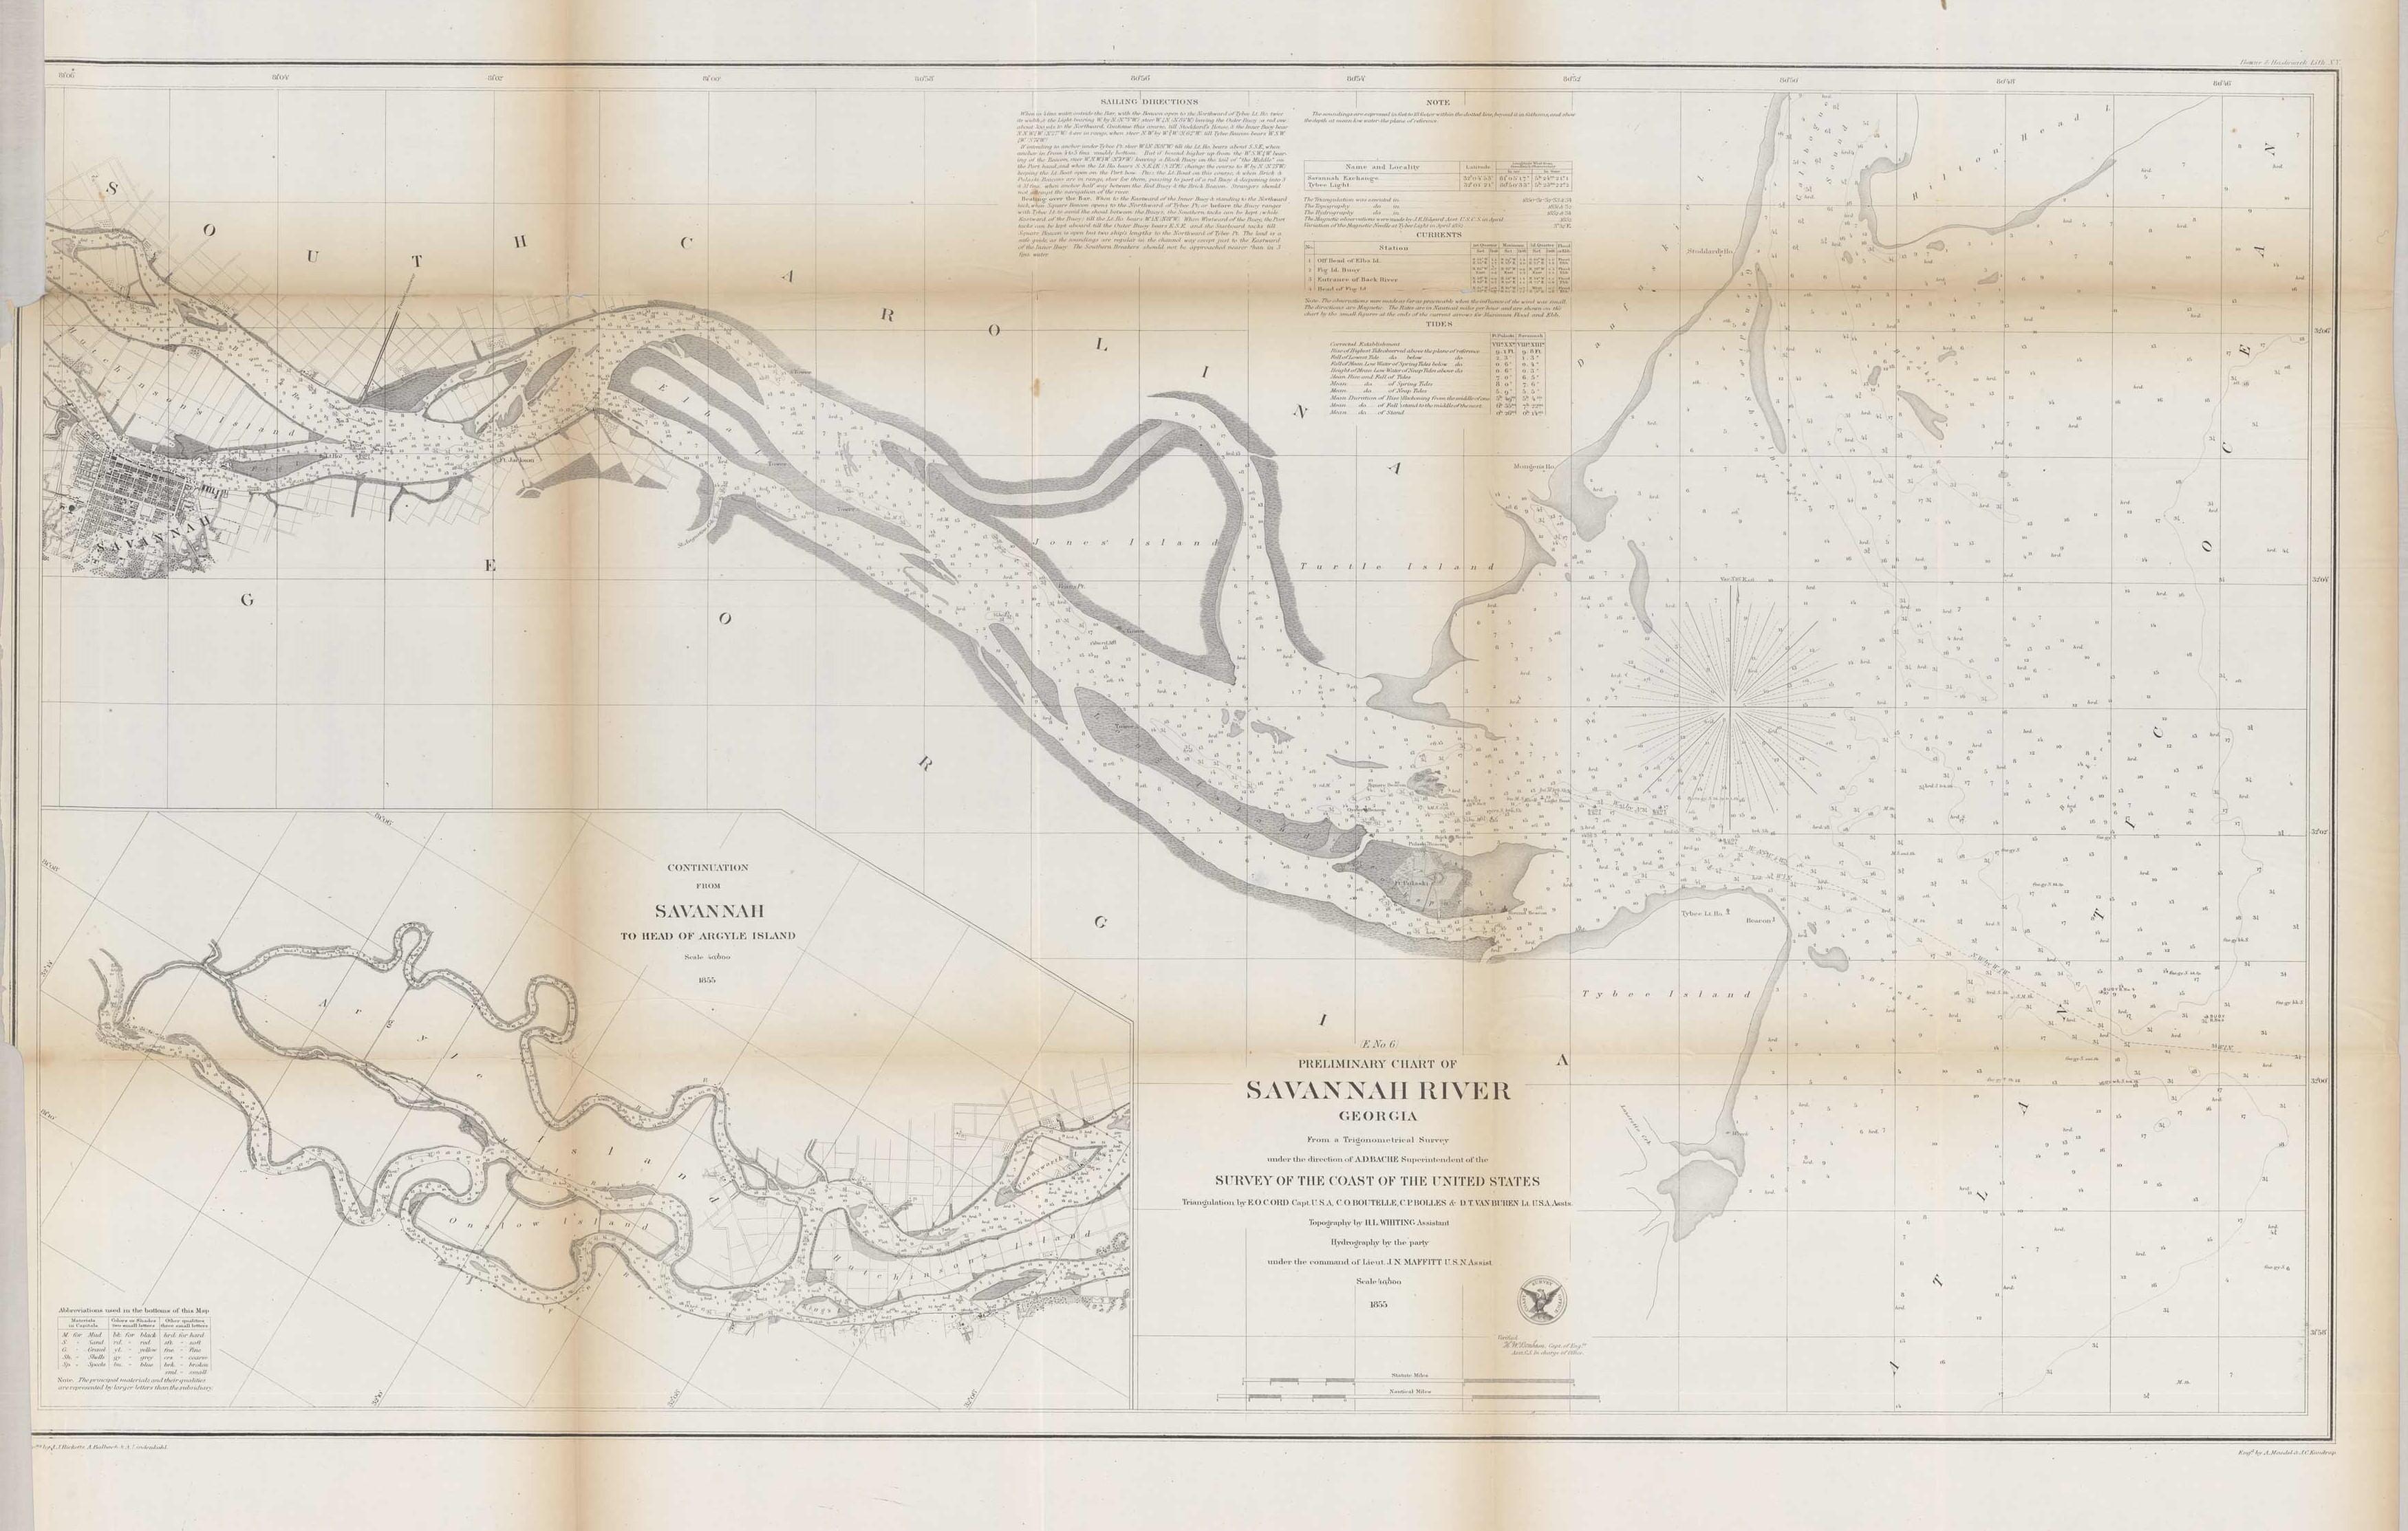 Preliminary Chart of Savannah River Georgia